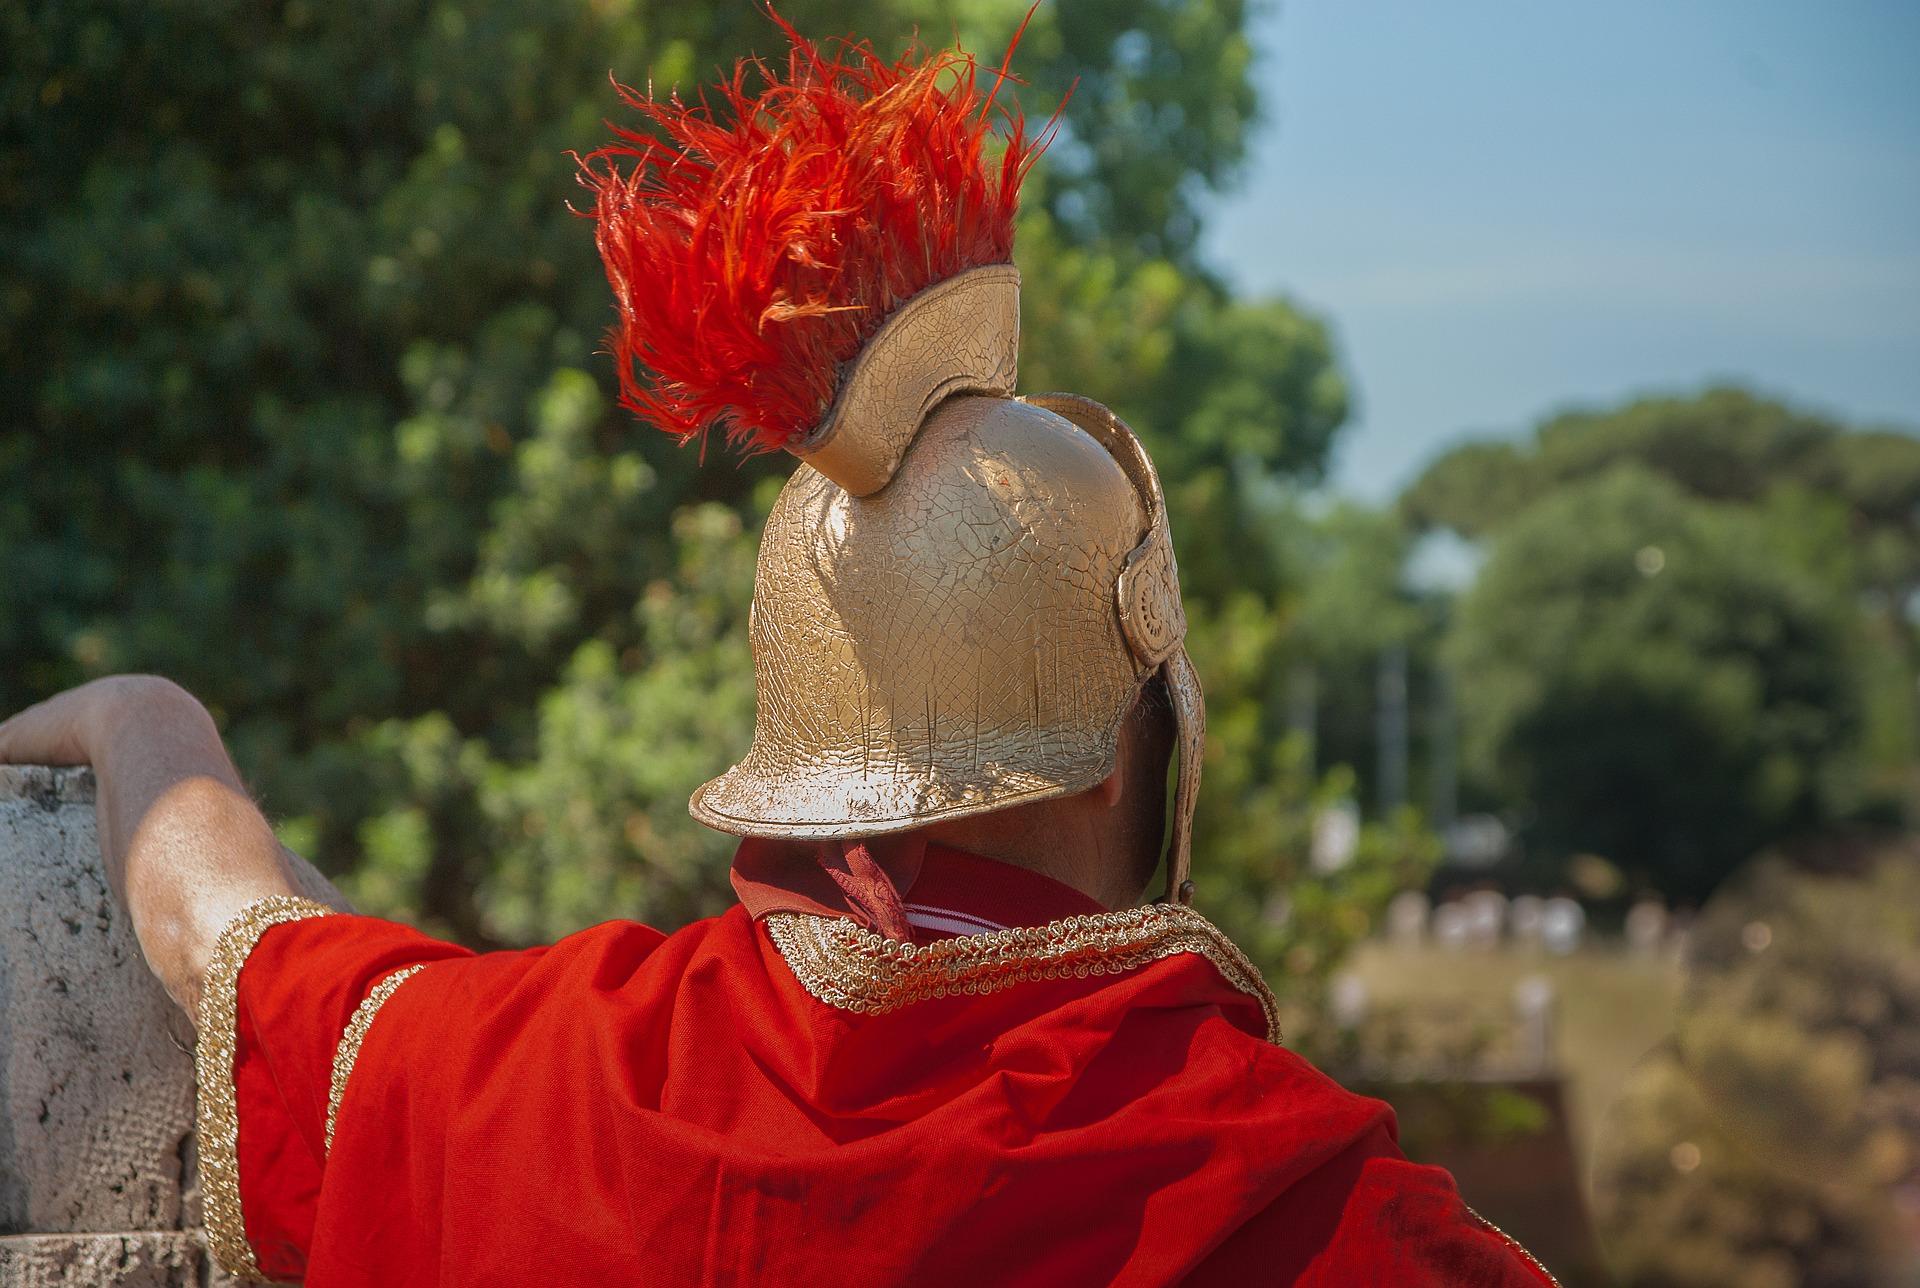 The Righteous Roman